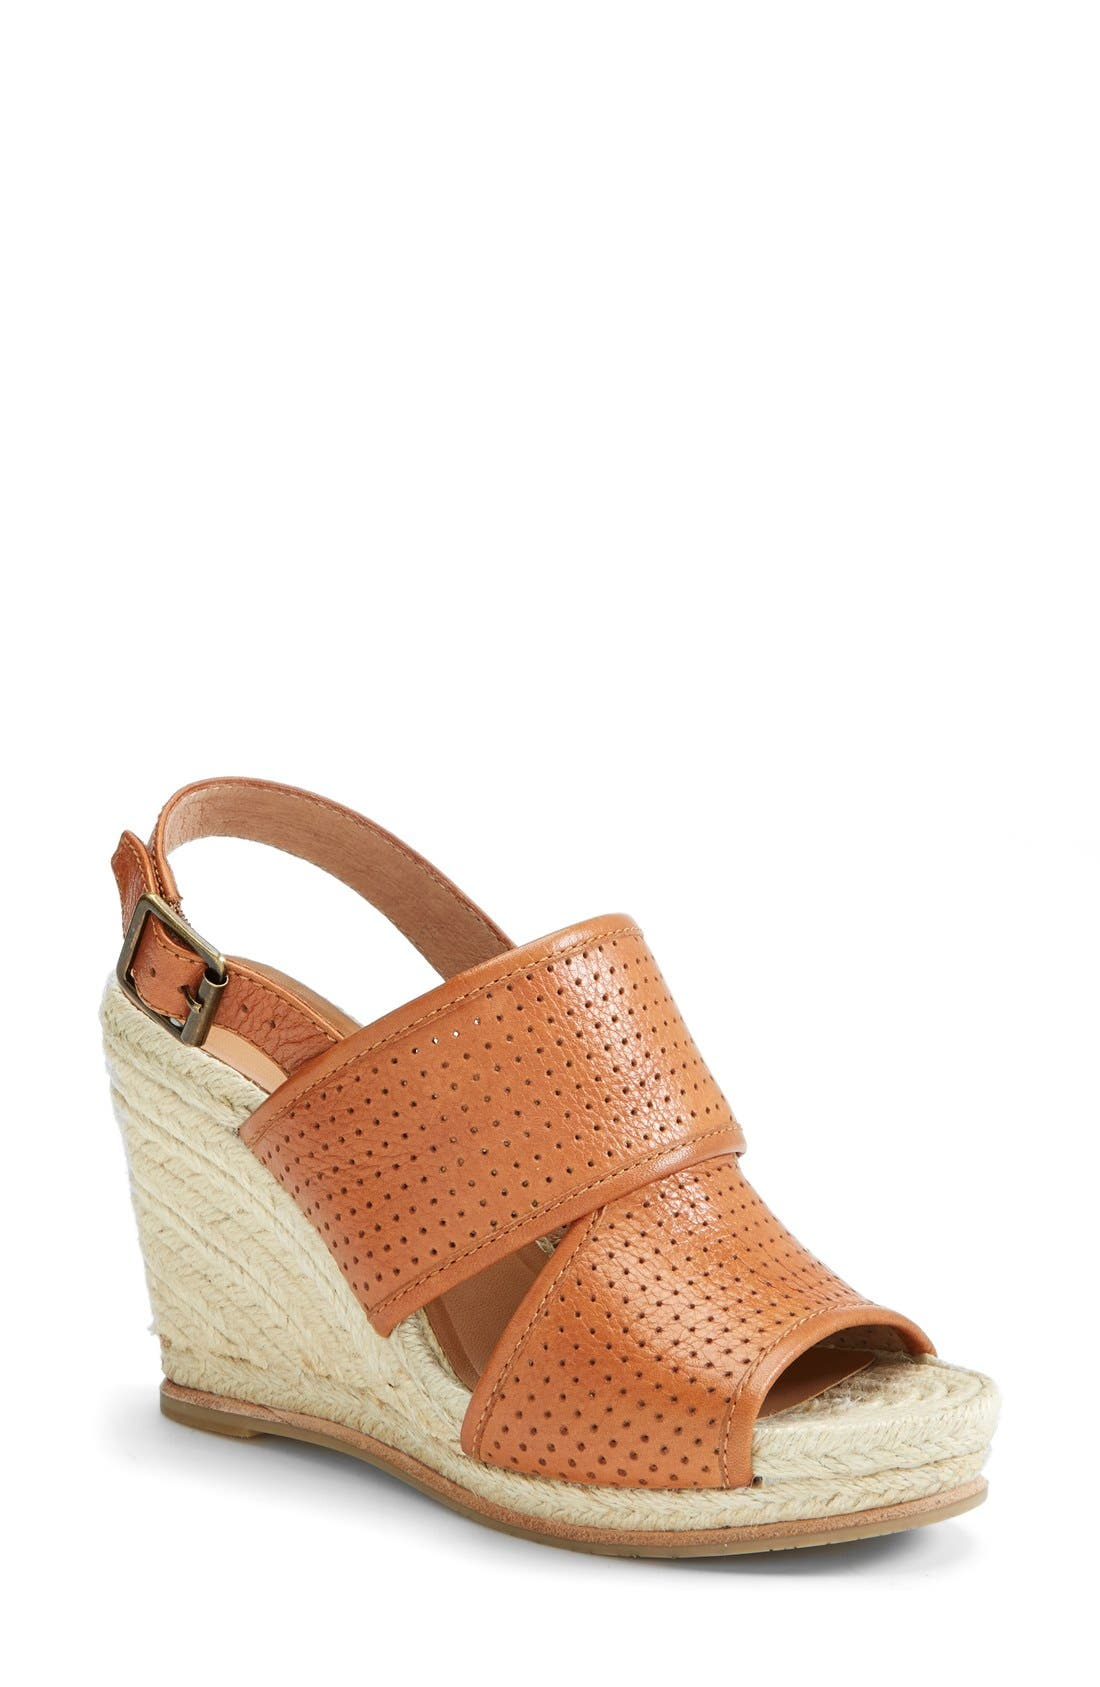 Main Image - Biala 'Joyce' Perforated Espadrille Wedge Sandal (Women)